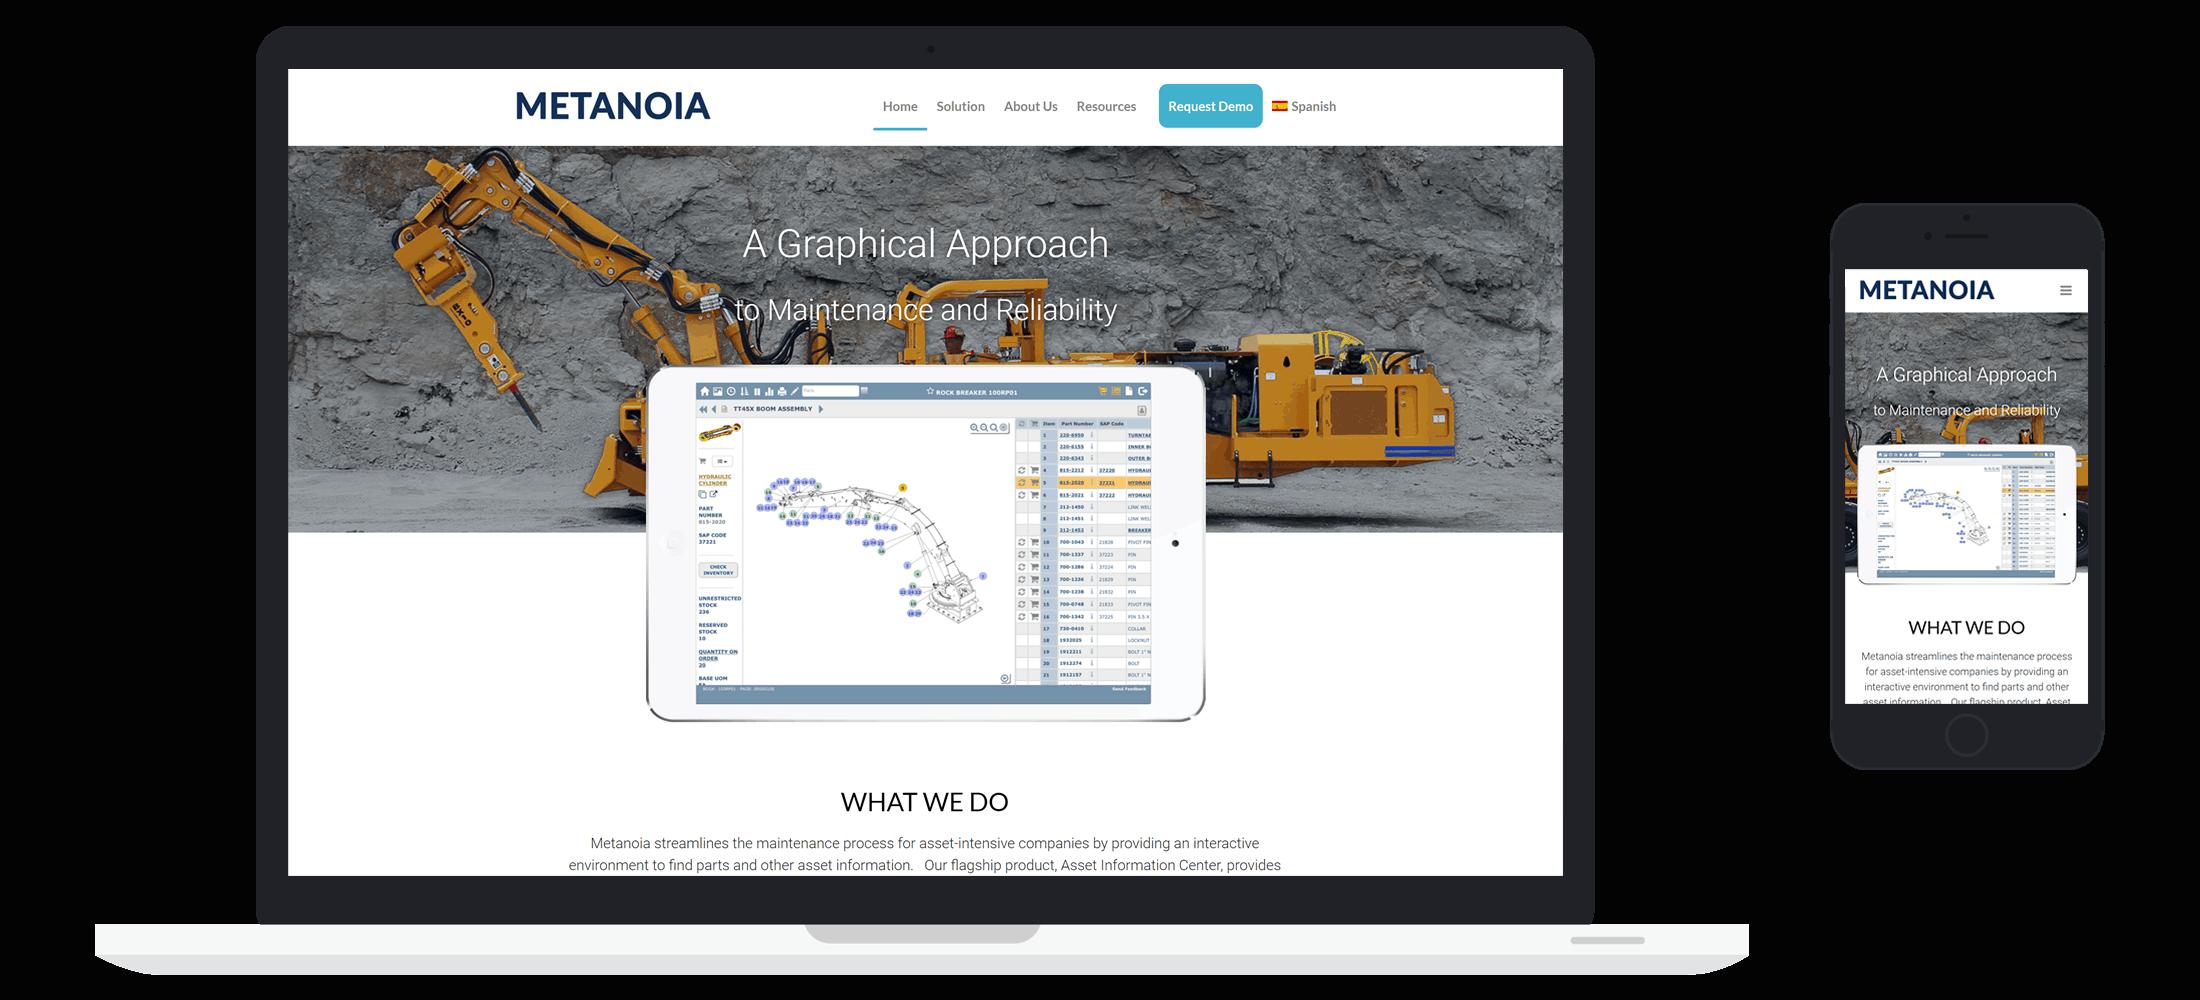 Managed IT Website client - Metanoia Case Study